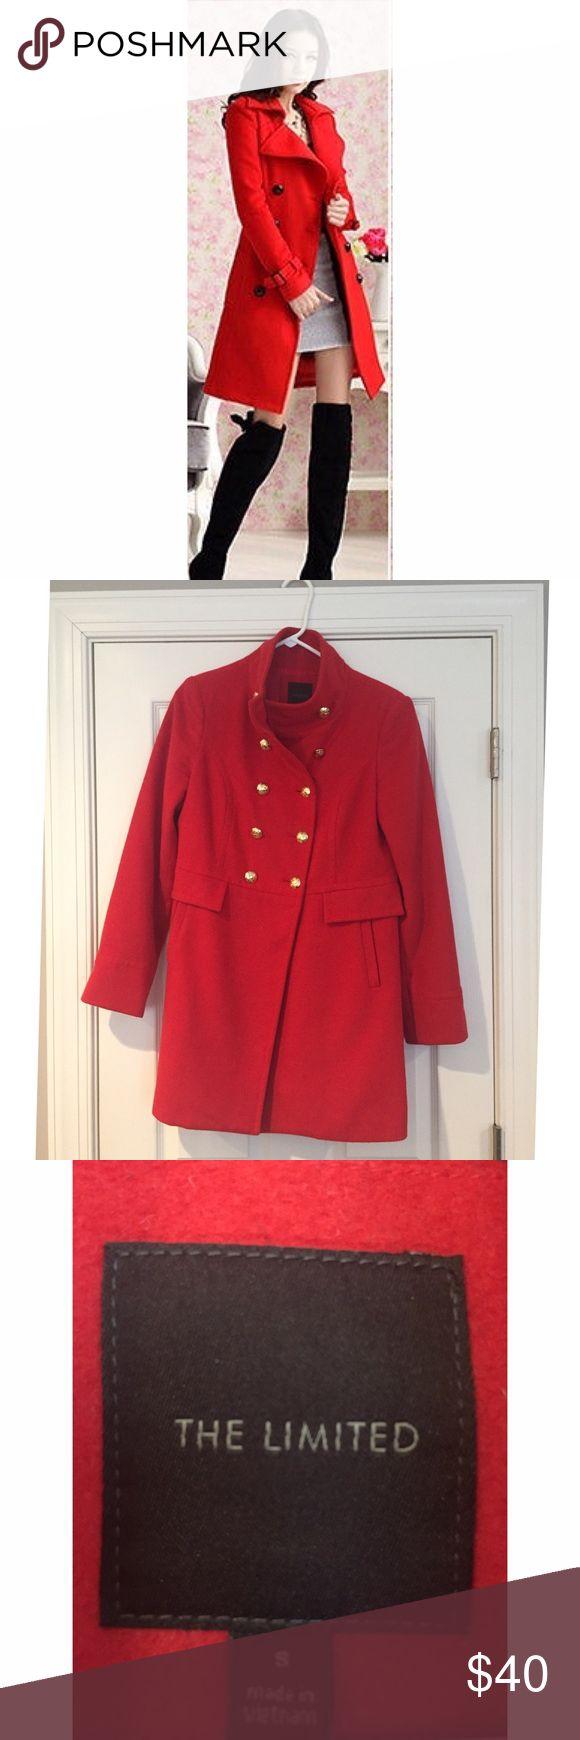 1000  ideas about Red Pea Coats on Pinterest | Pea coat Cruel